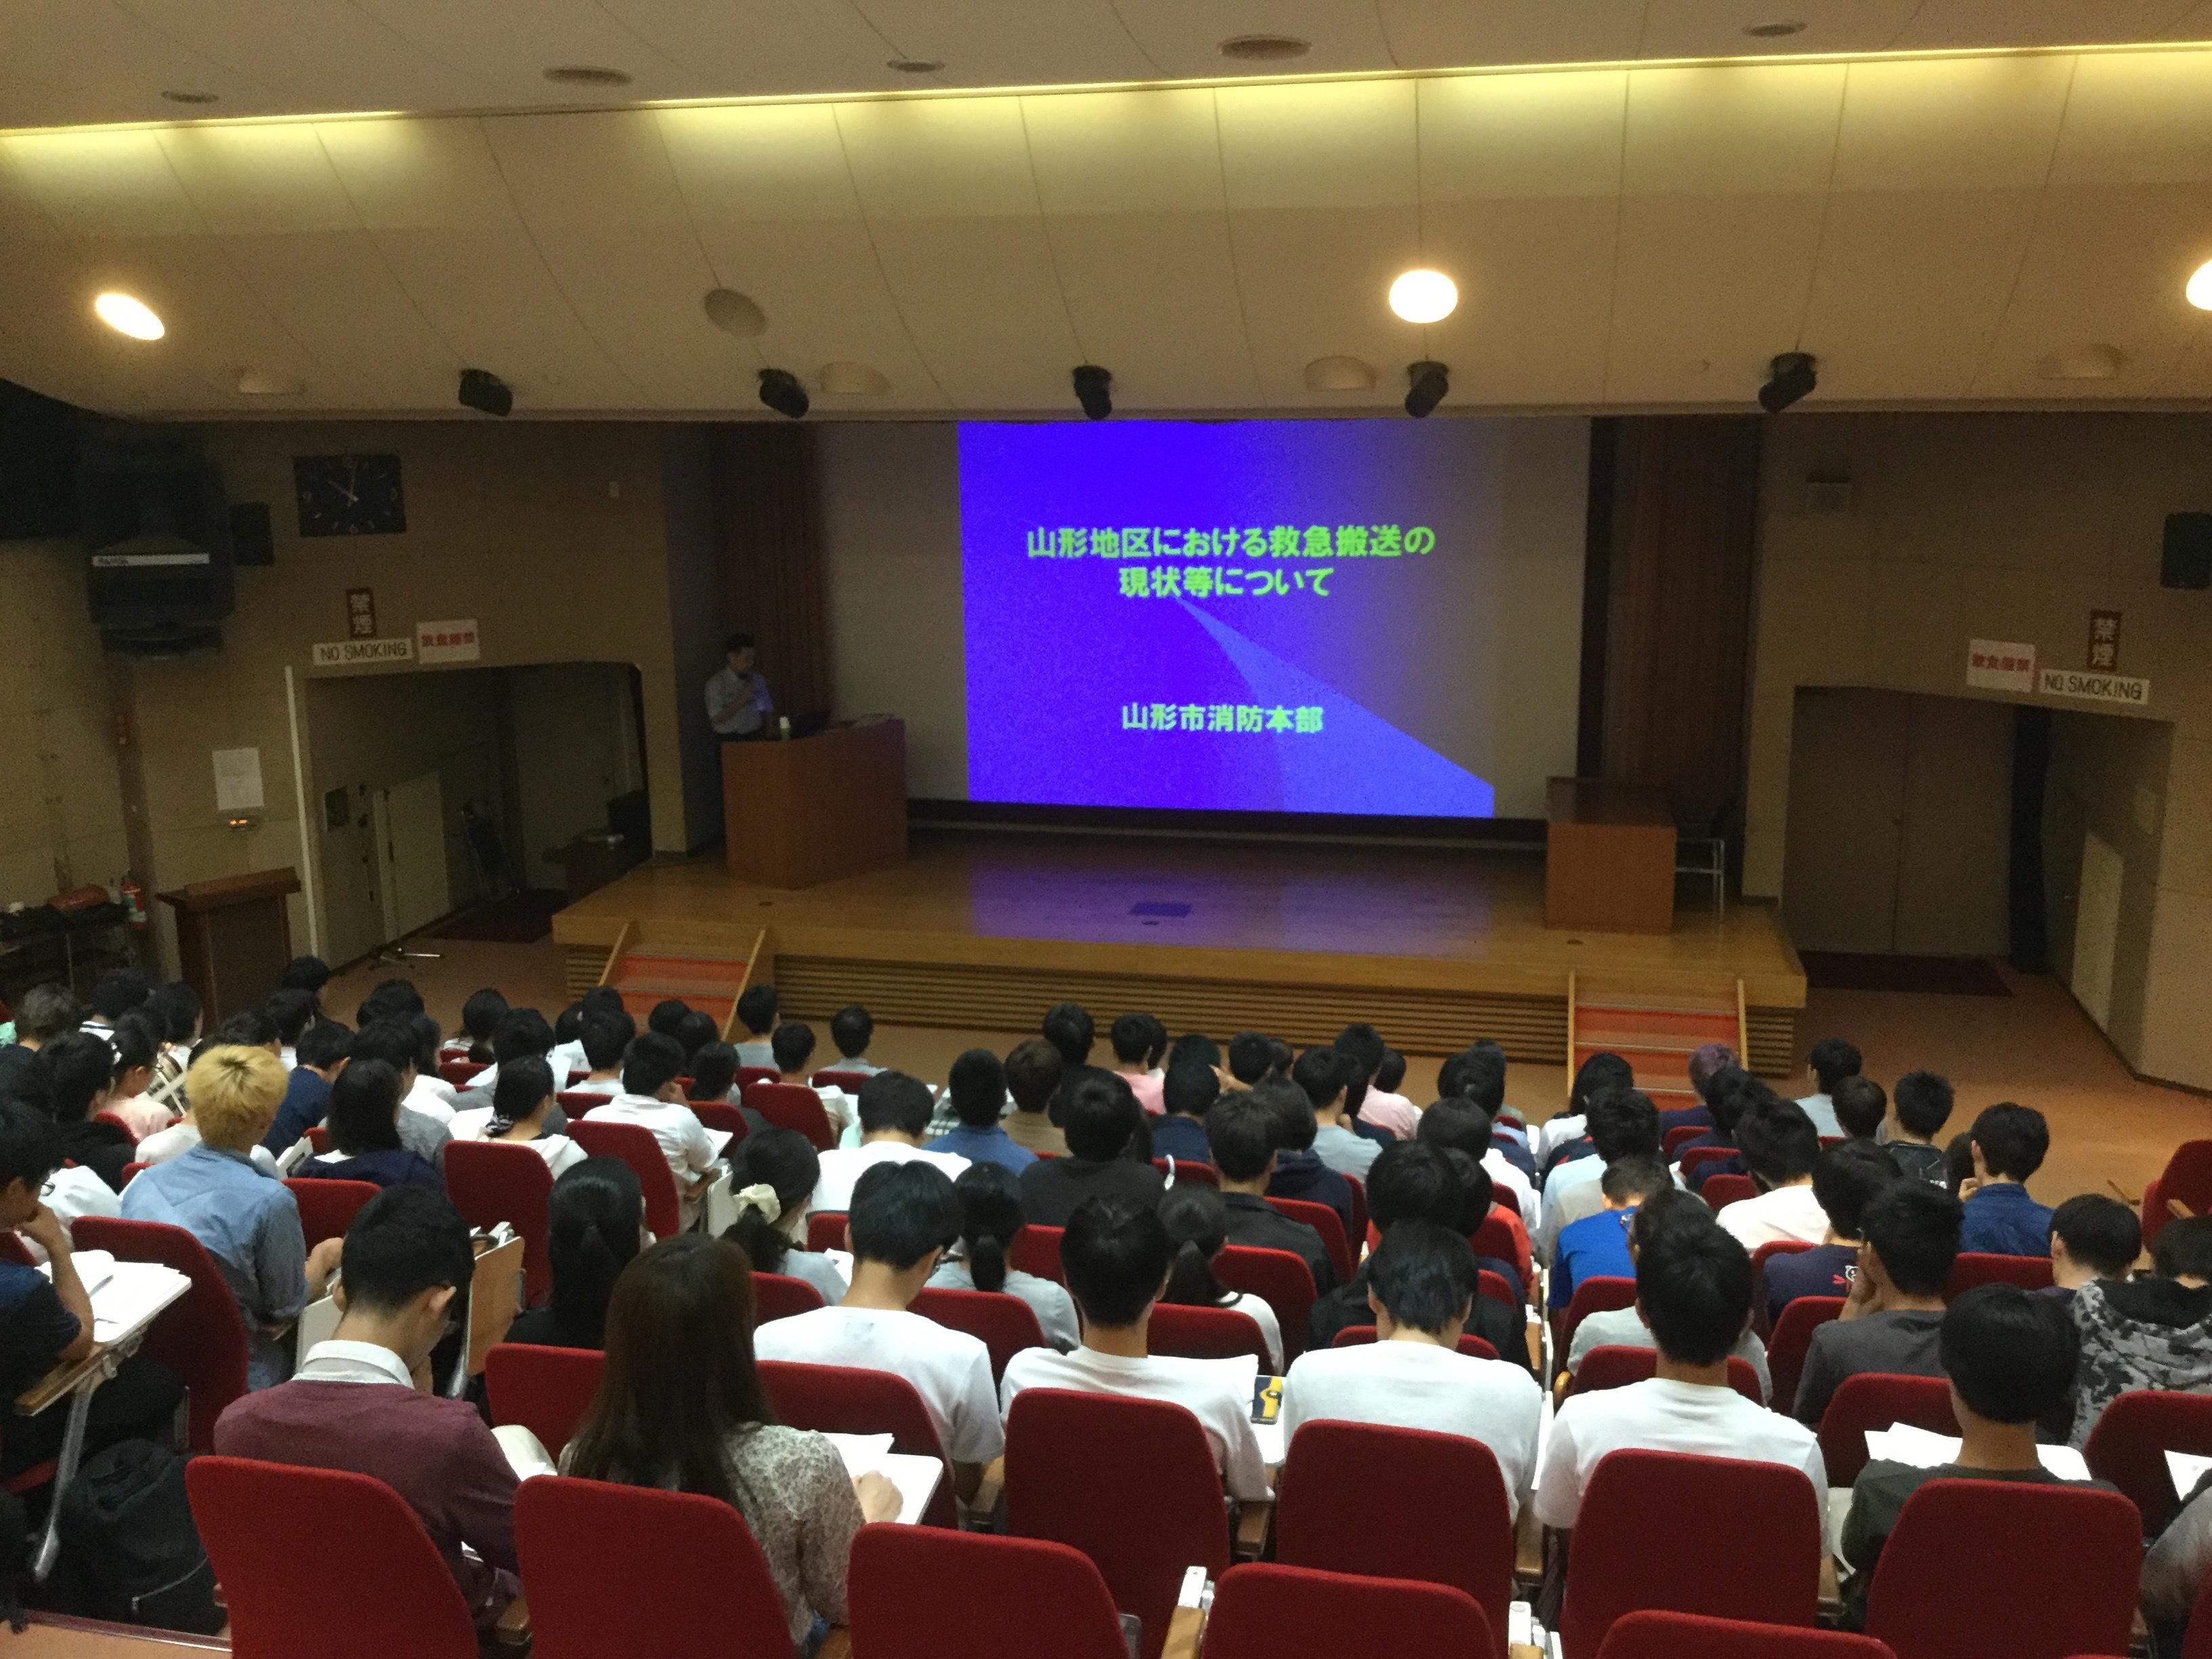 2018早期医療体験消防井上さん講義